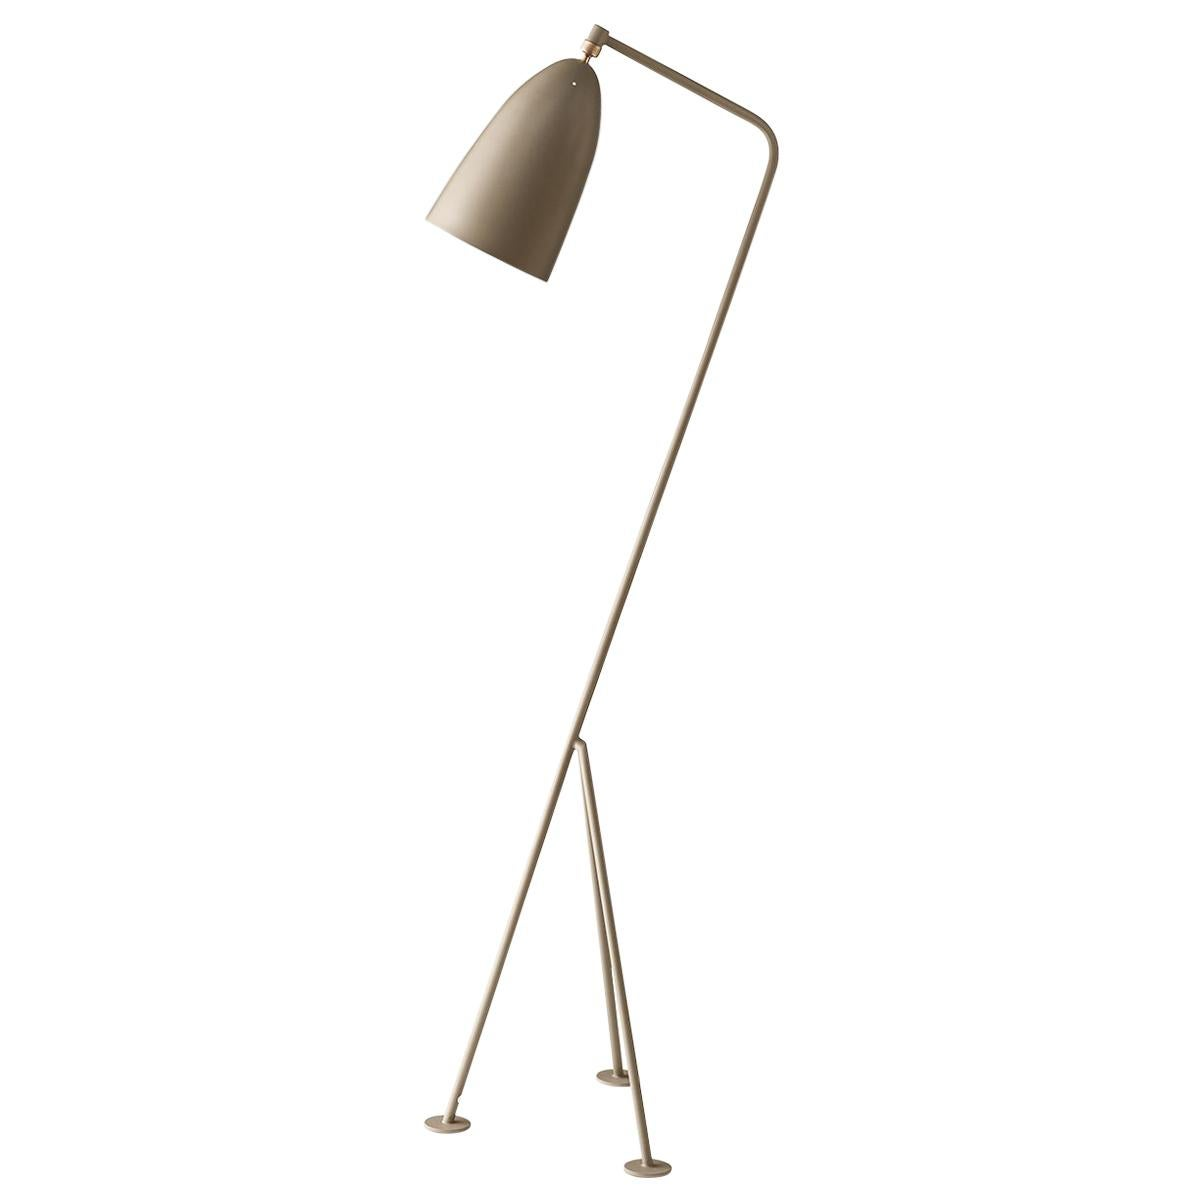 Greta Grossman Grasshopper Floor Lamp, Warm Grey